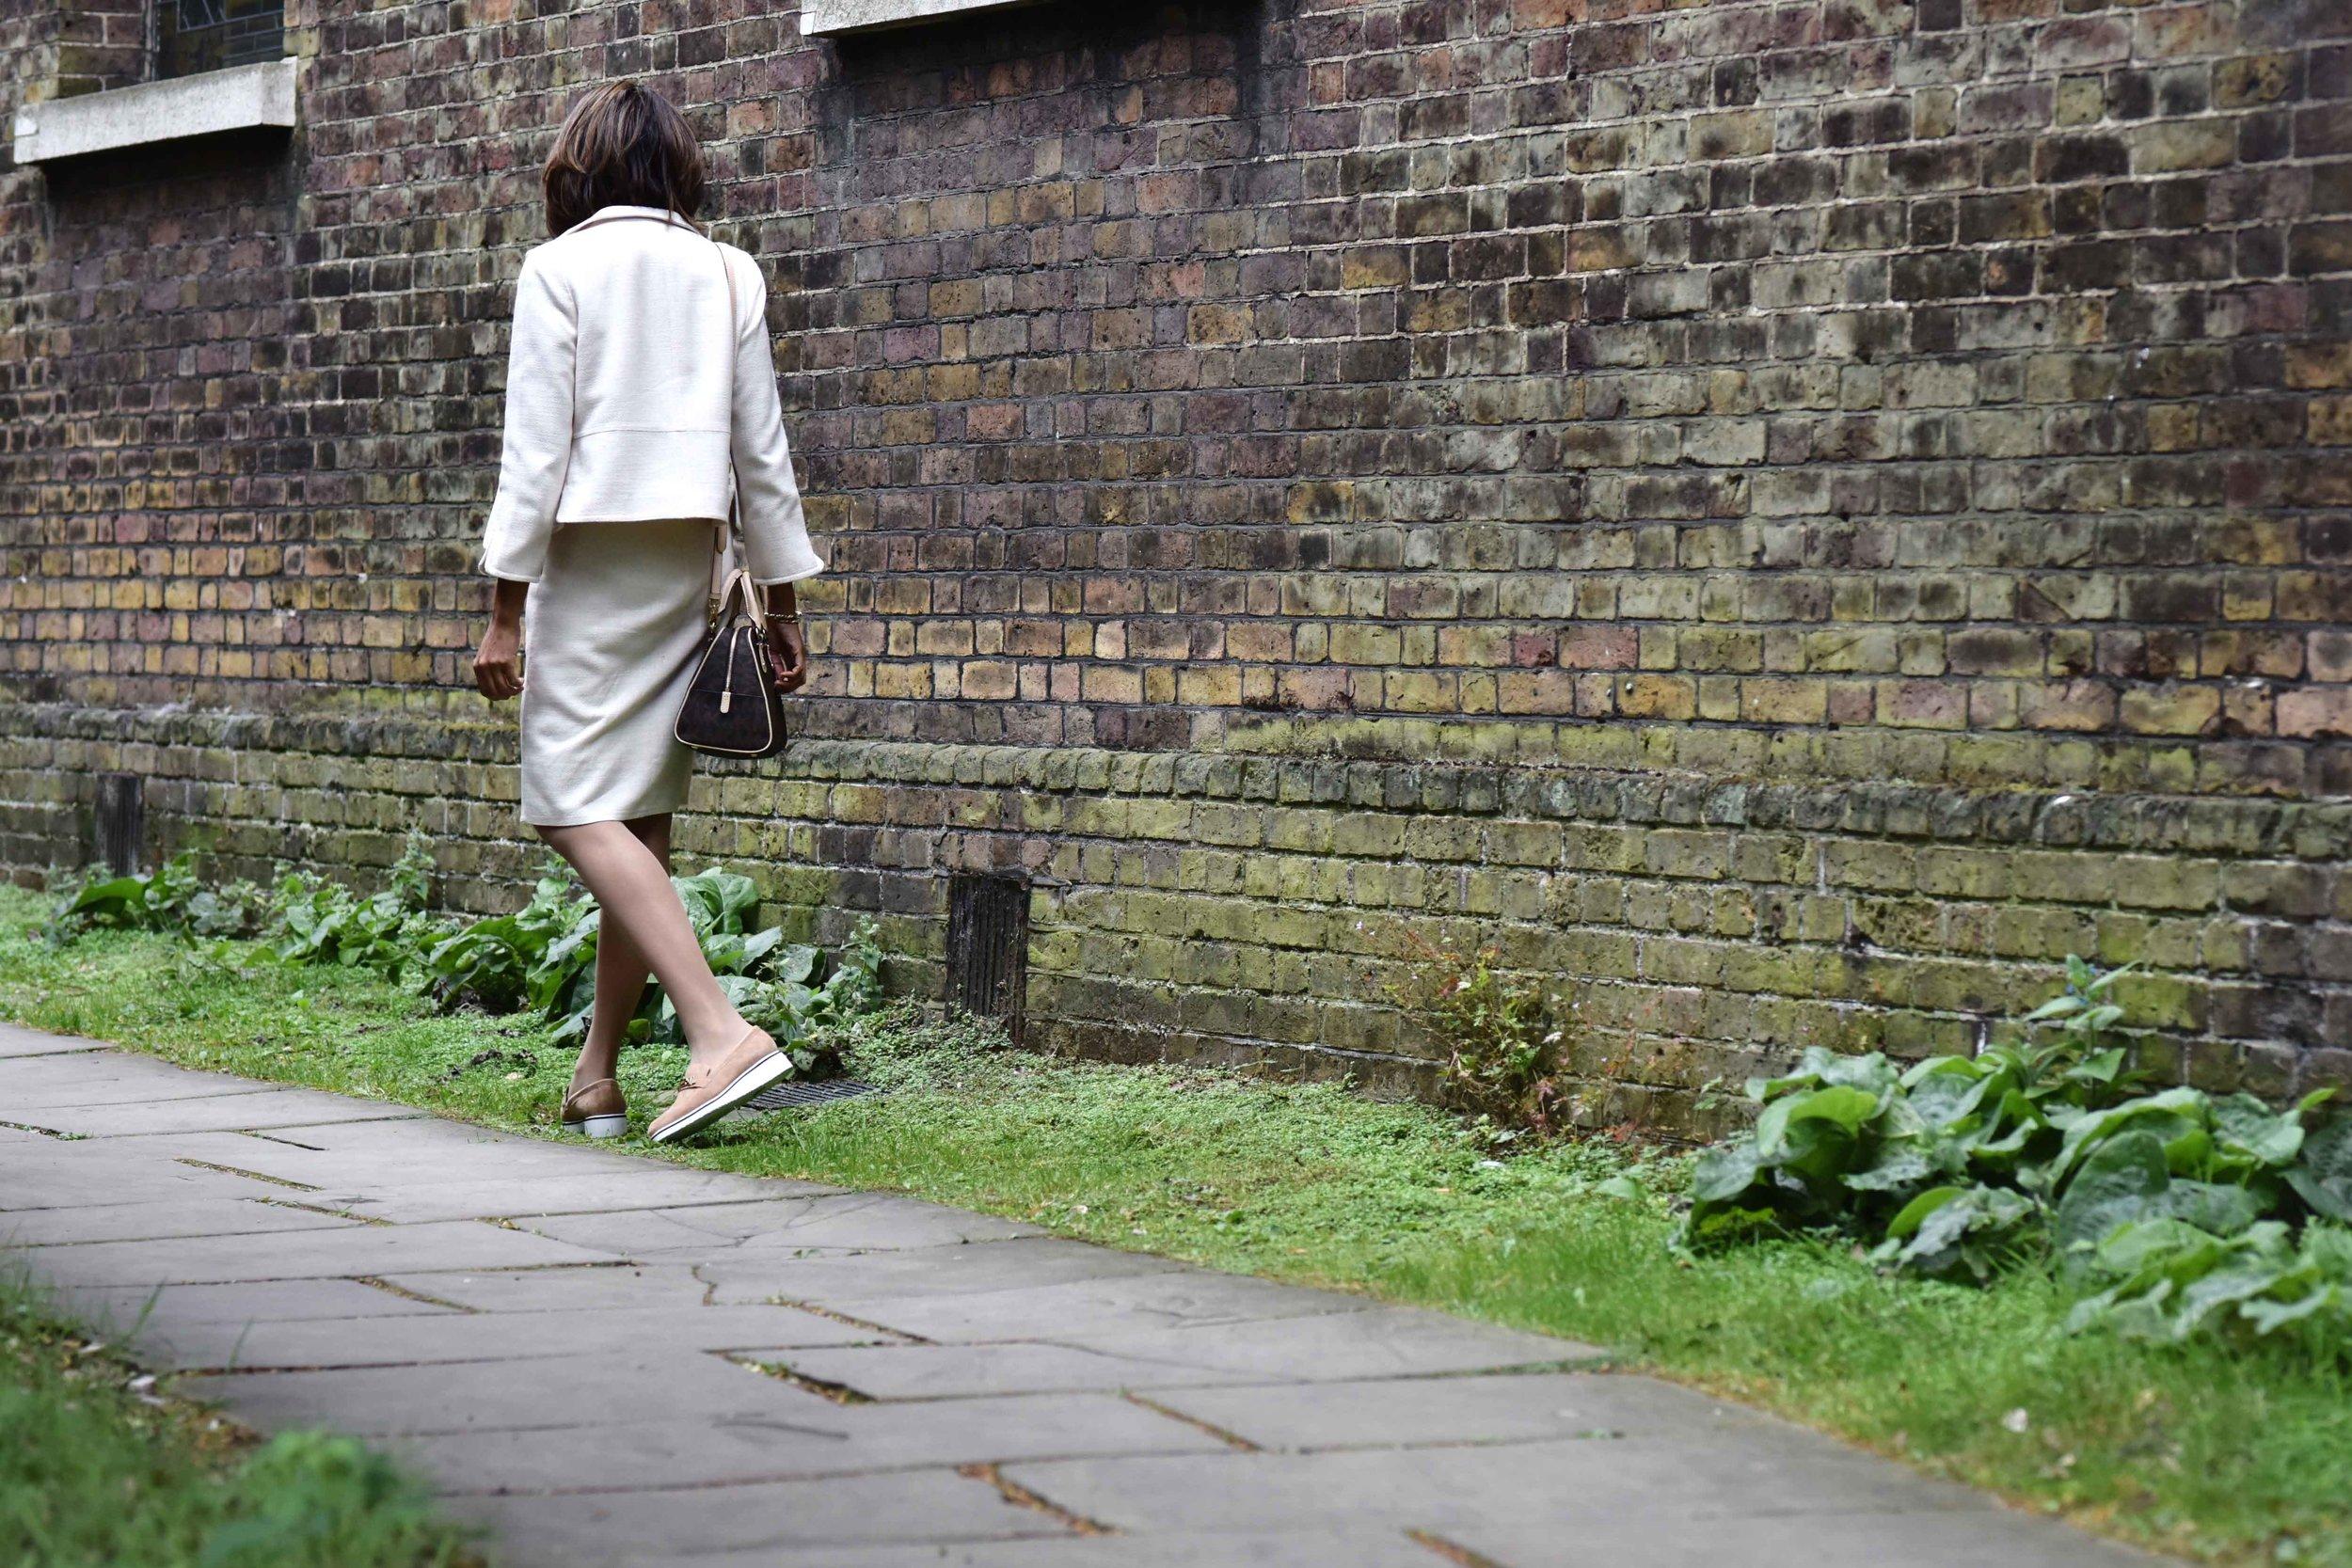 Talbots shift dress and jacket, Michael Kors bag, River Island shoes. Image©sourcingstyle.com